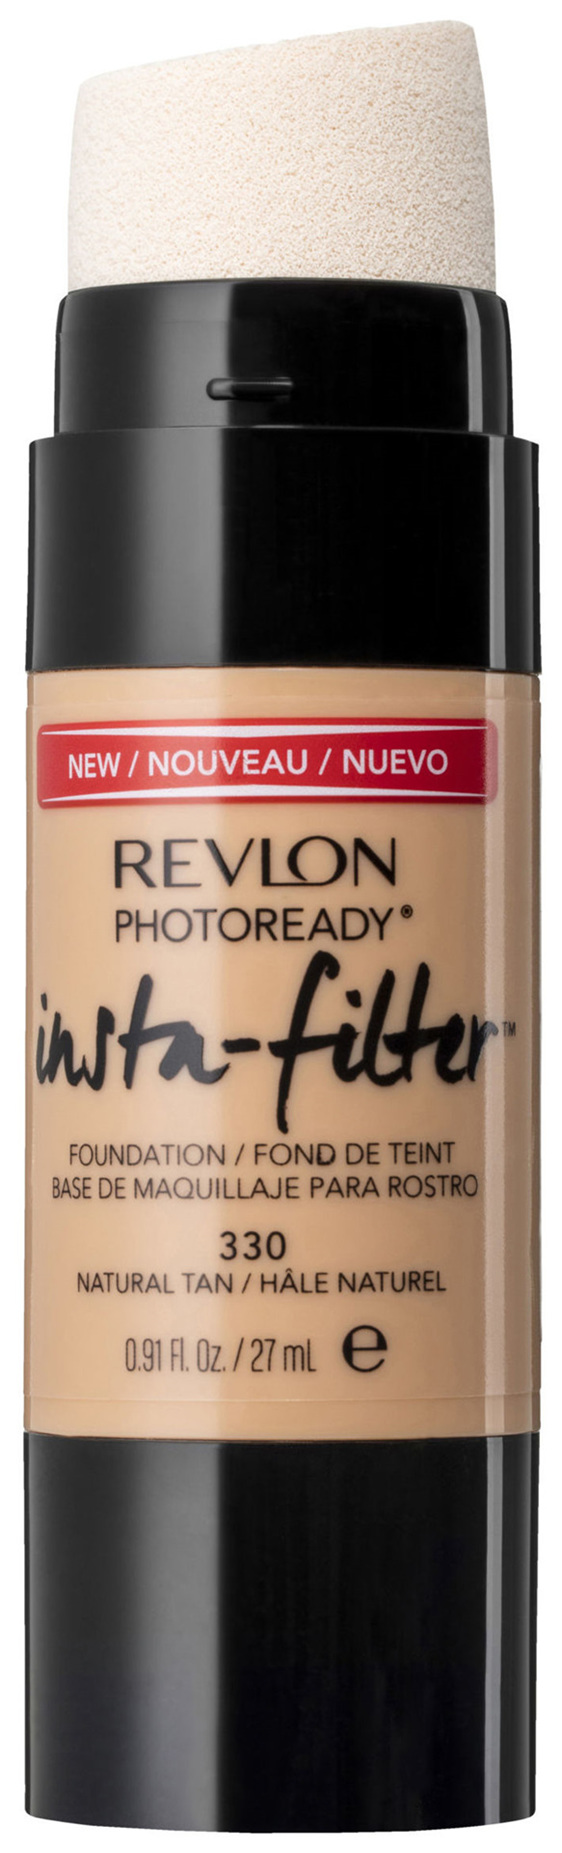 Revlon Photoready Insta-Filter™ Foundation Natural Tan